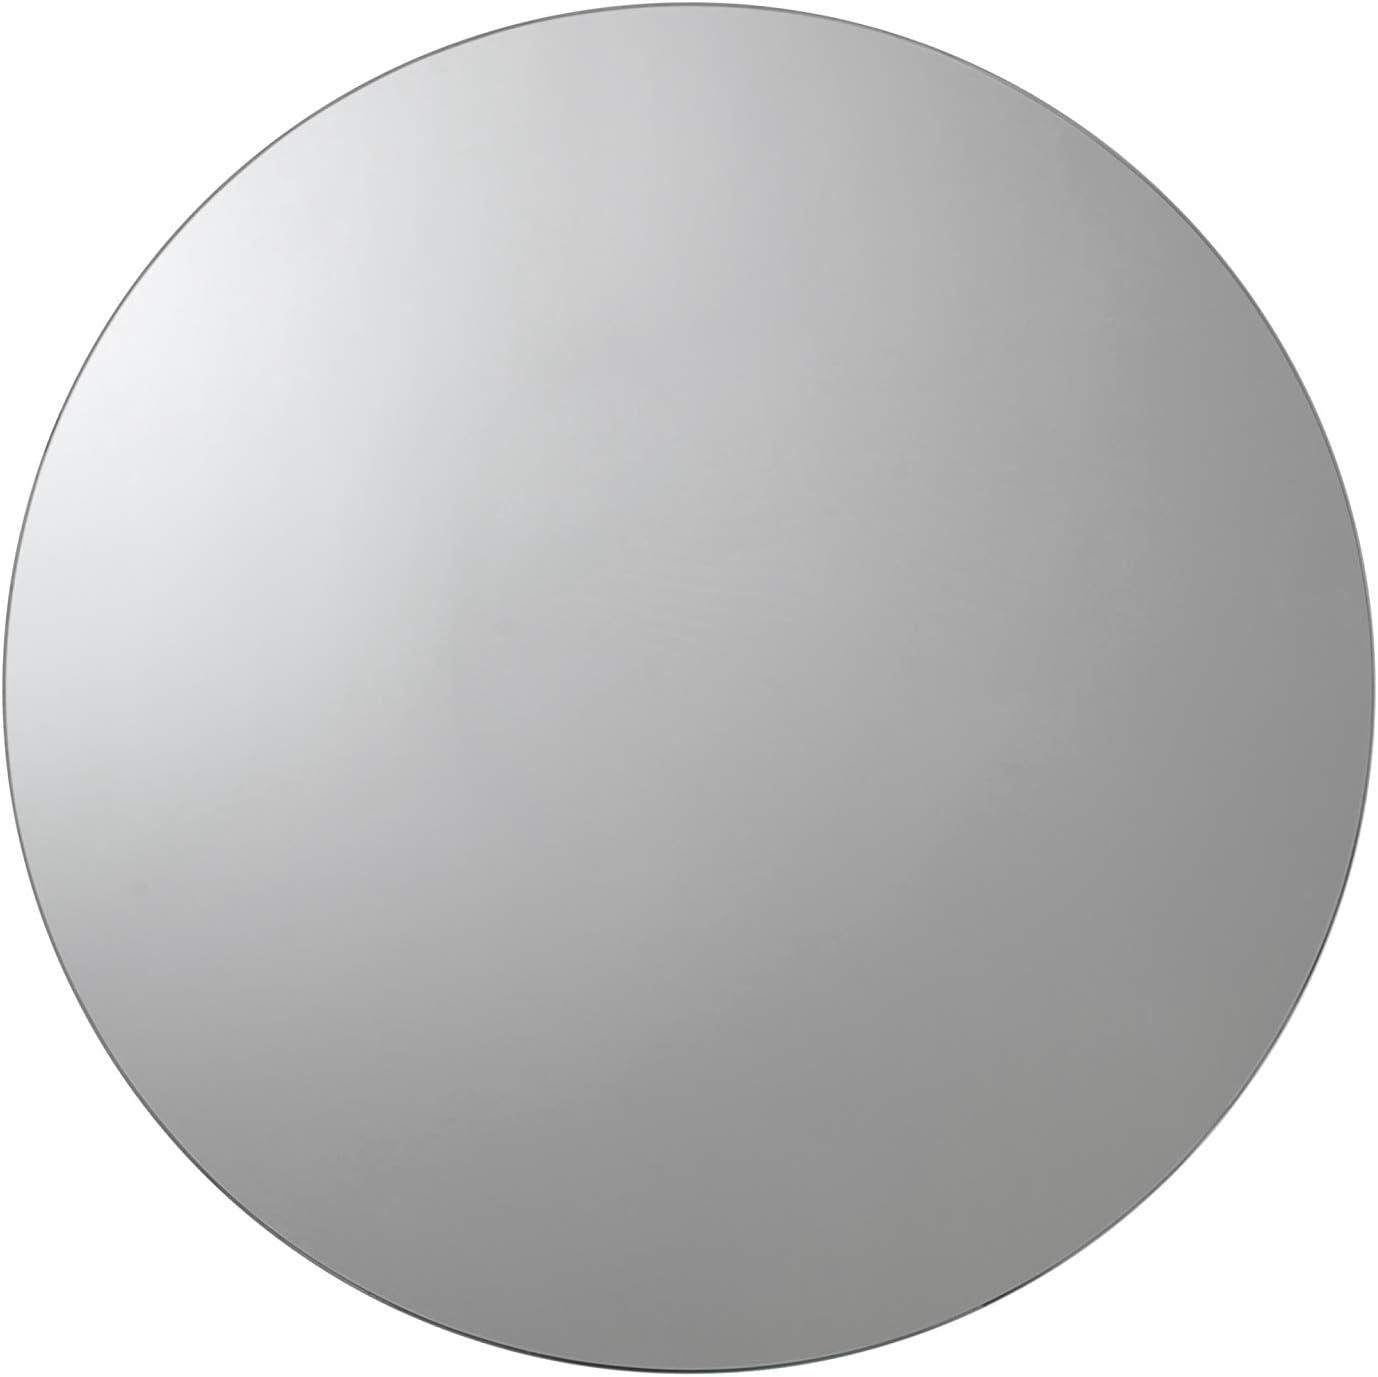 Croydex Severn Stainless Steel Circular Medicine Cabinet with Over Hanging Mirror Door, 19.7 x 19.7 x 3.9 In.